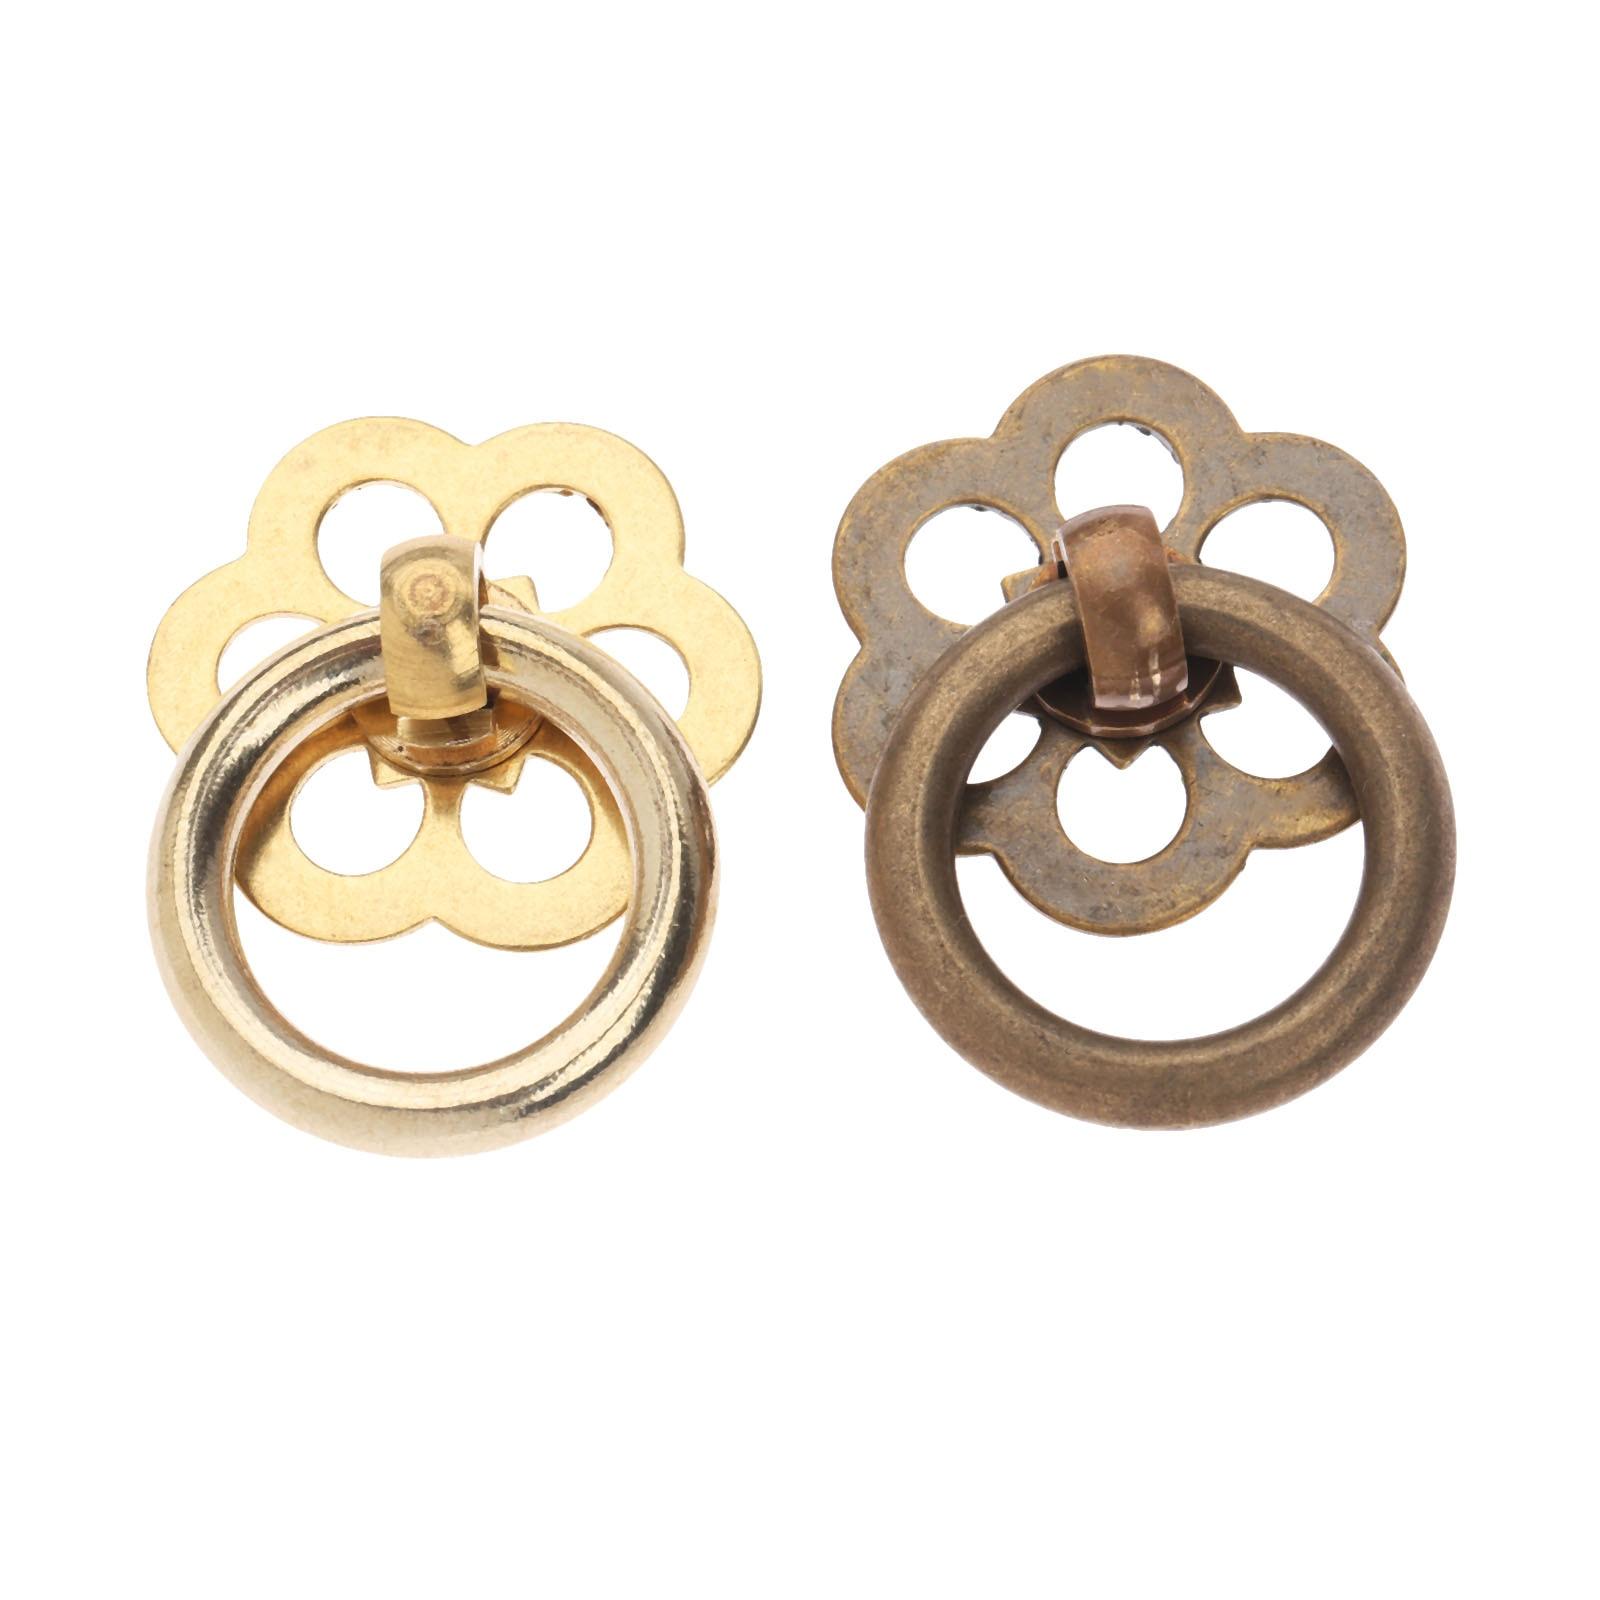 Dreld Vintage Brass Jewelry Box Ring Knobs Furniture